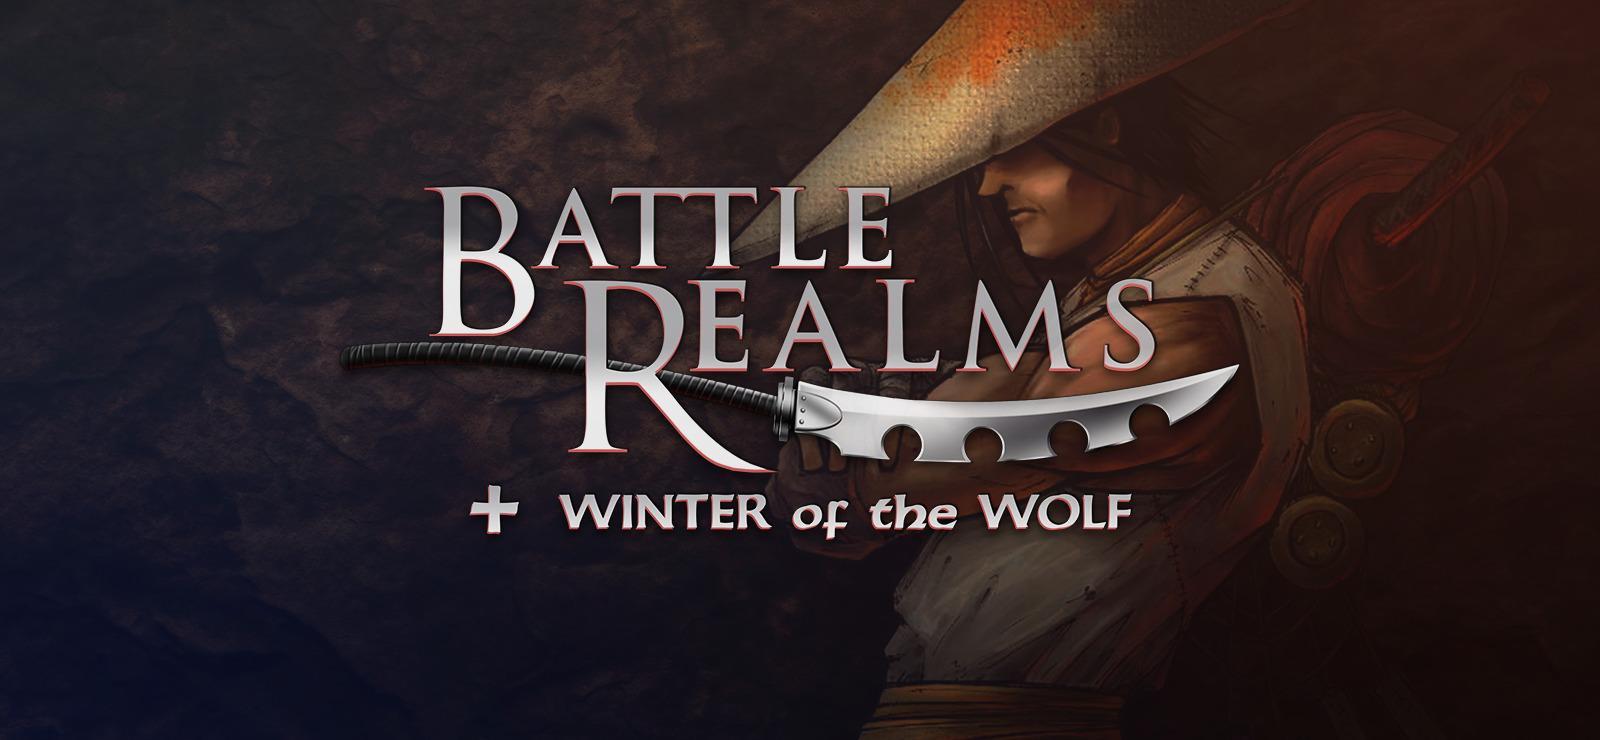 Battle Realms 4122019 4